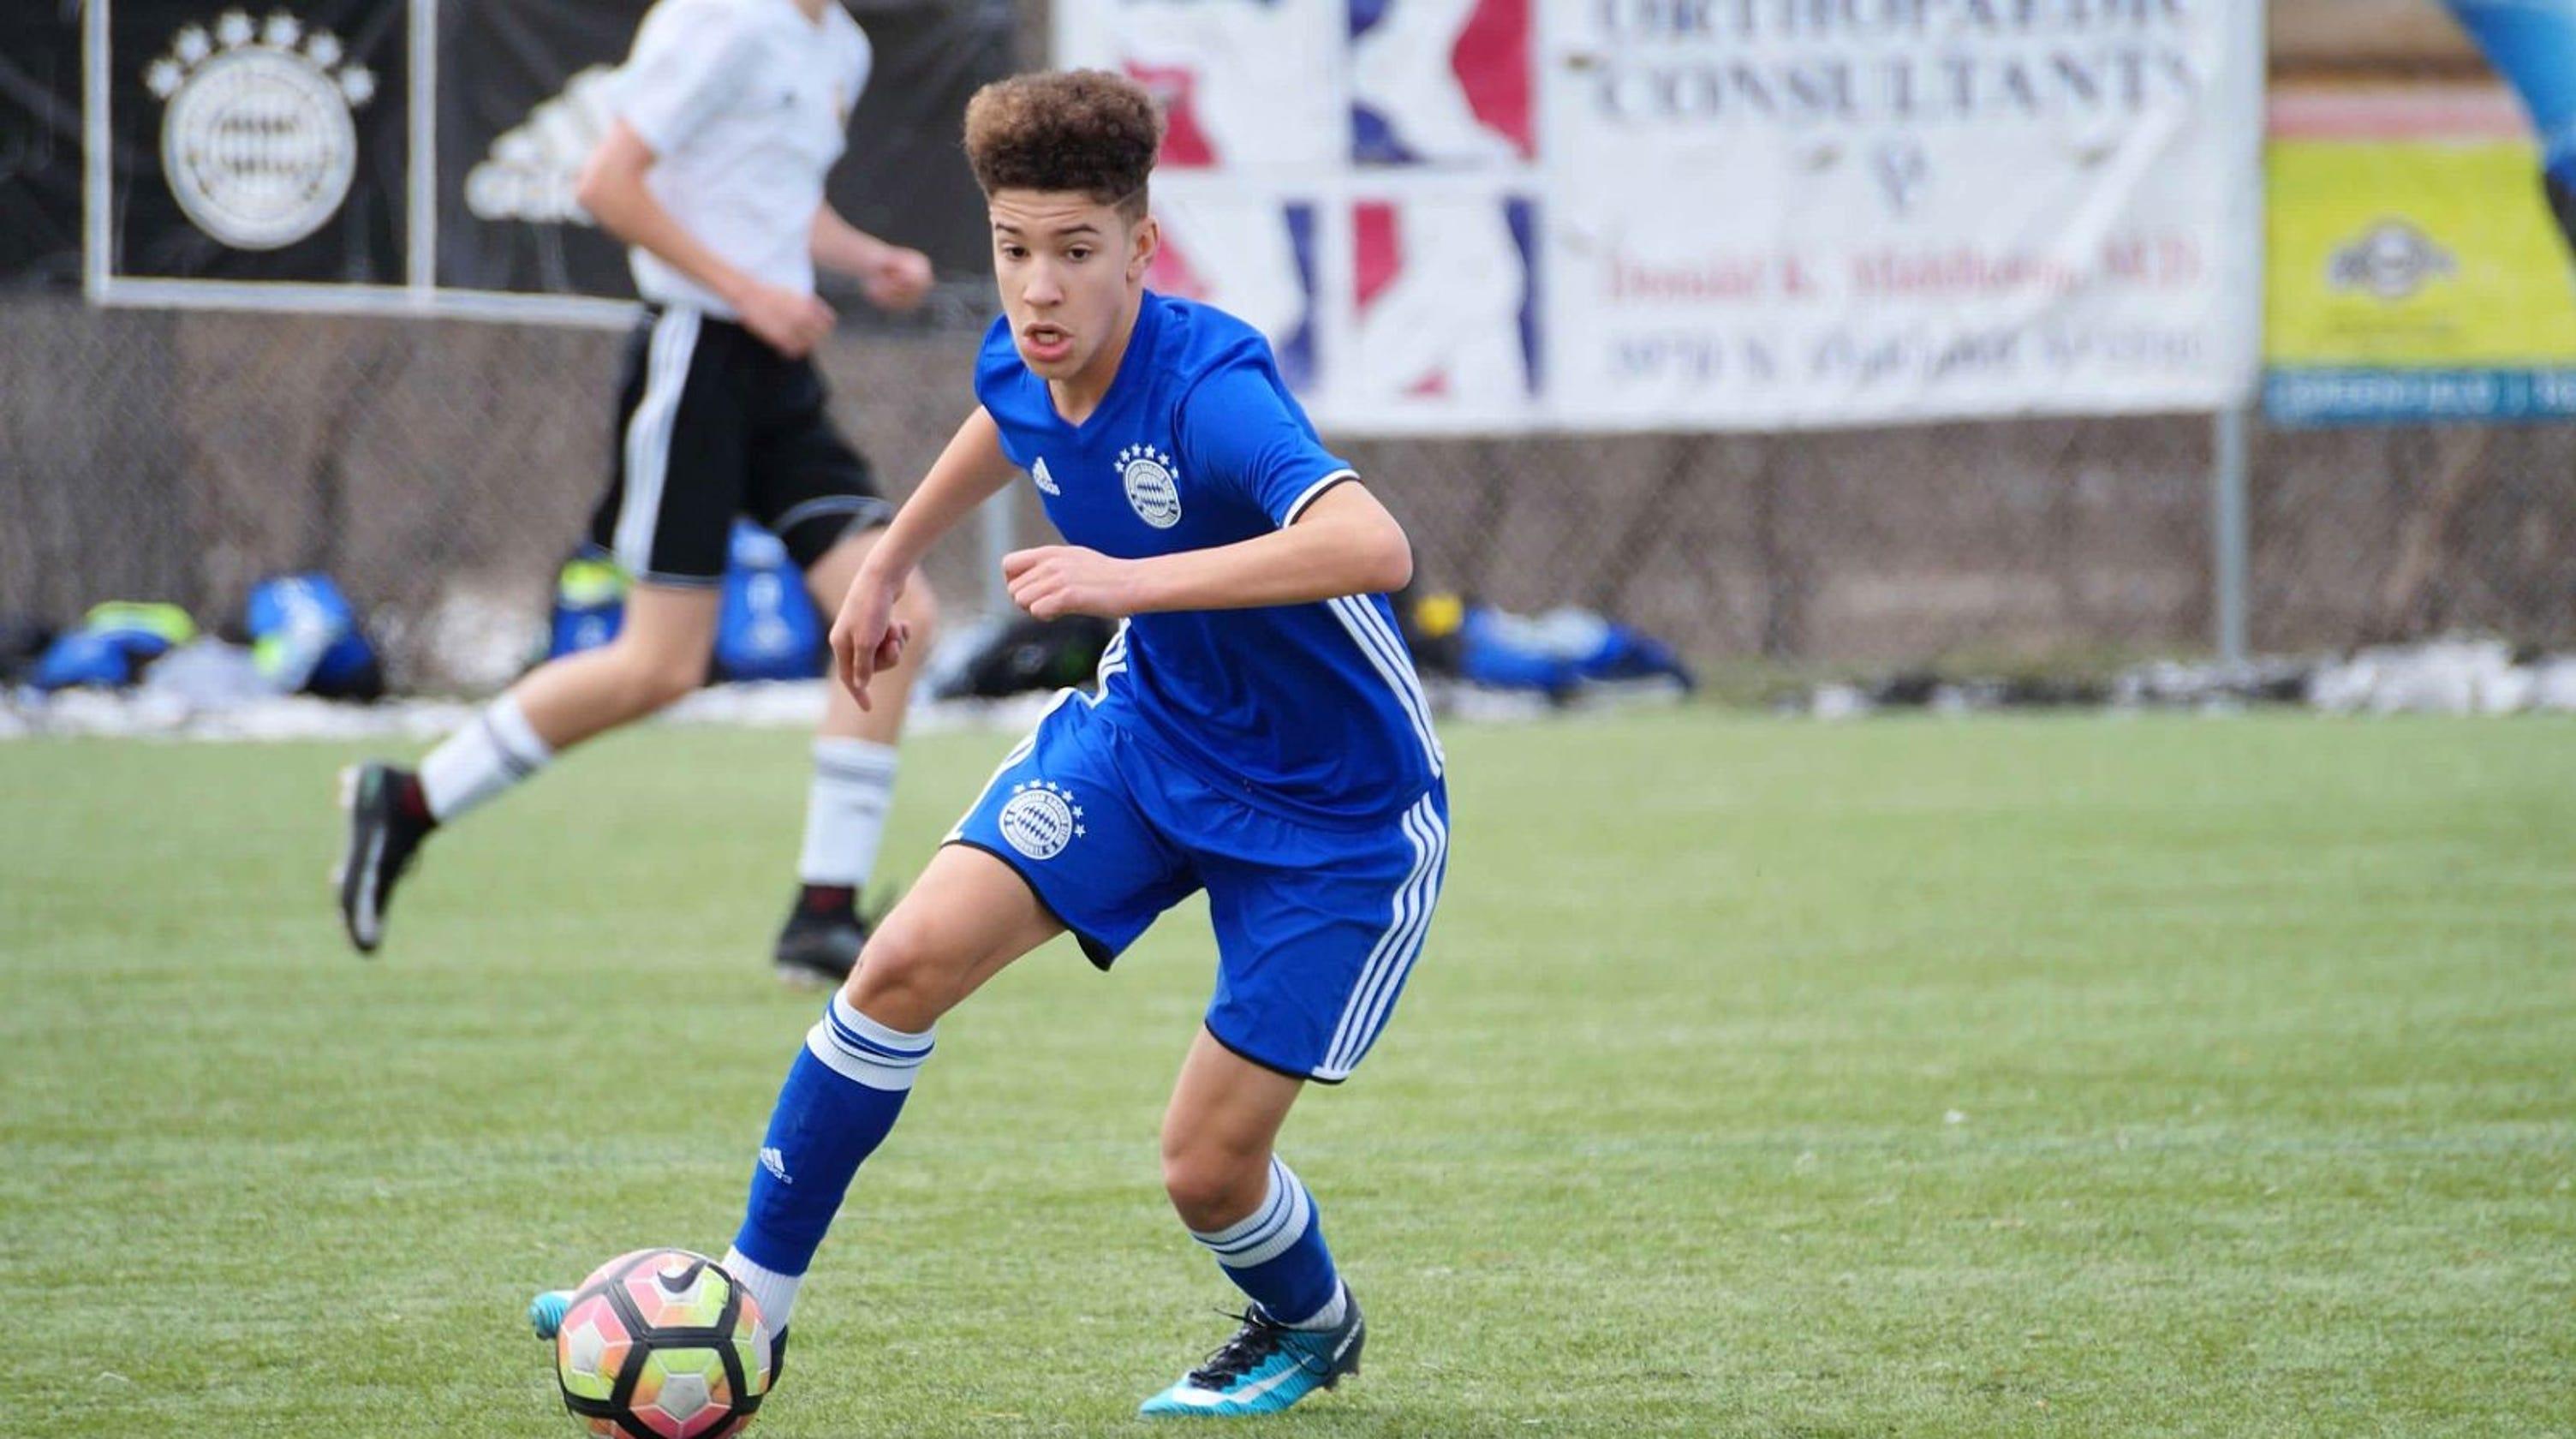 U S  Soccer Olympic Development Program selects Fond du Lac